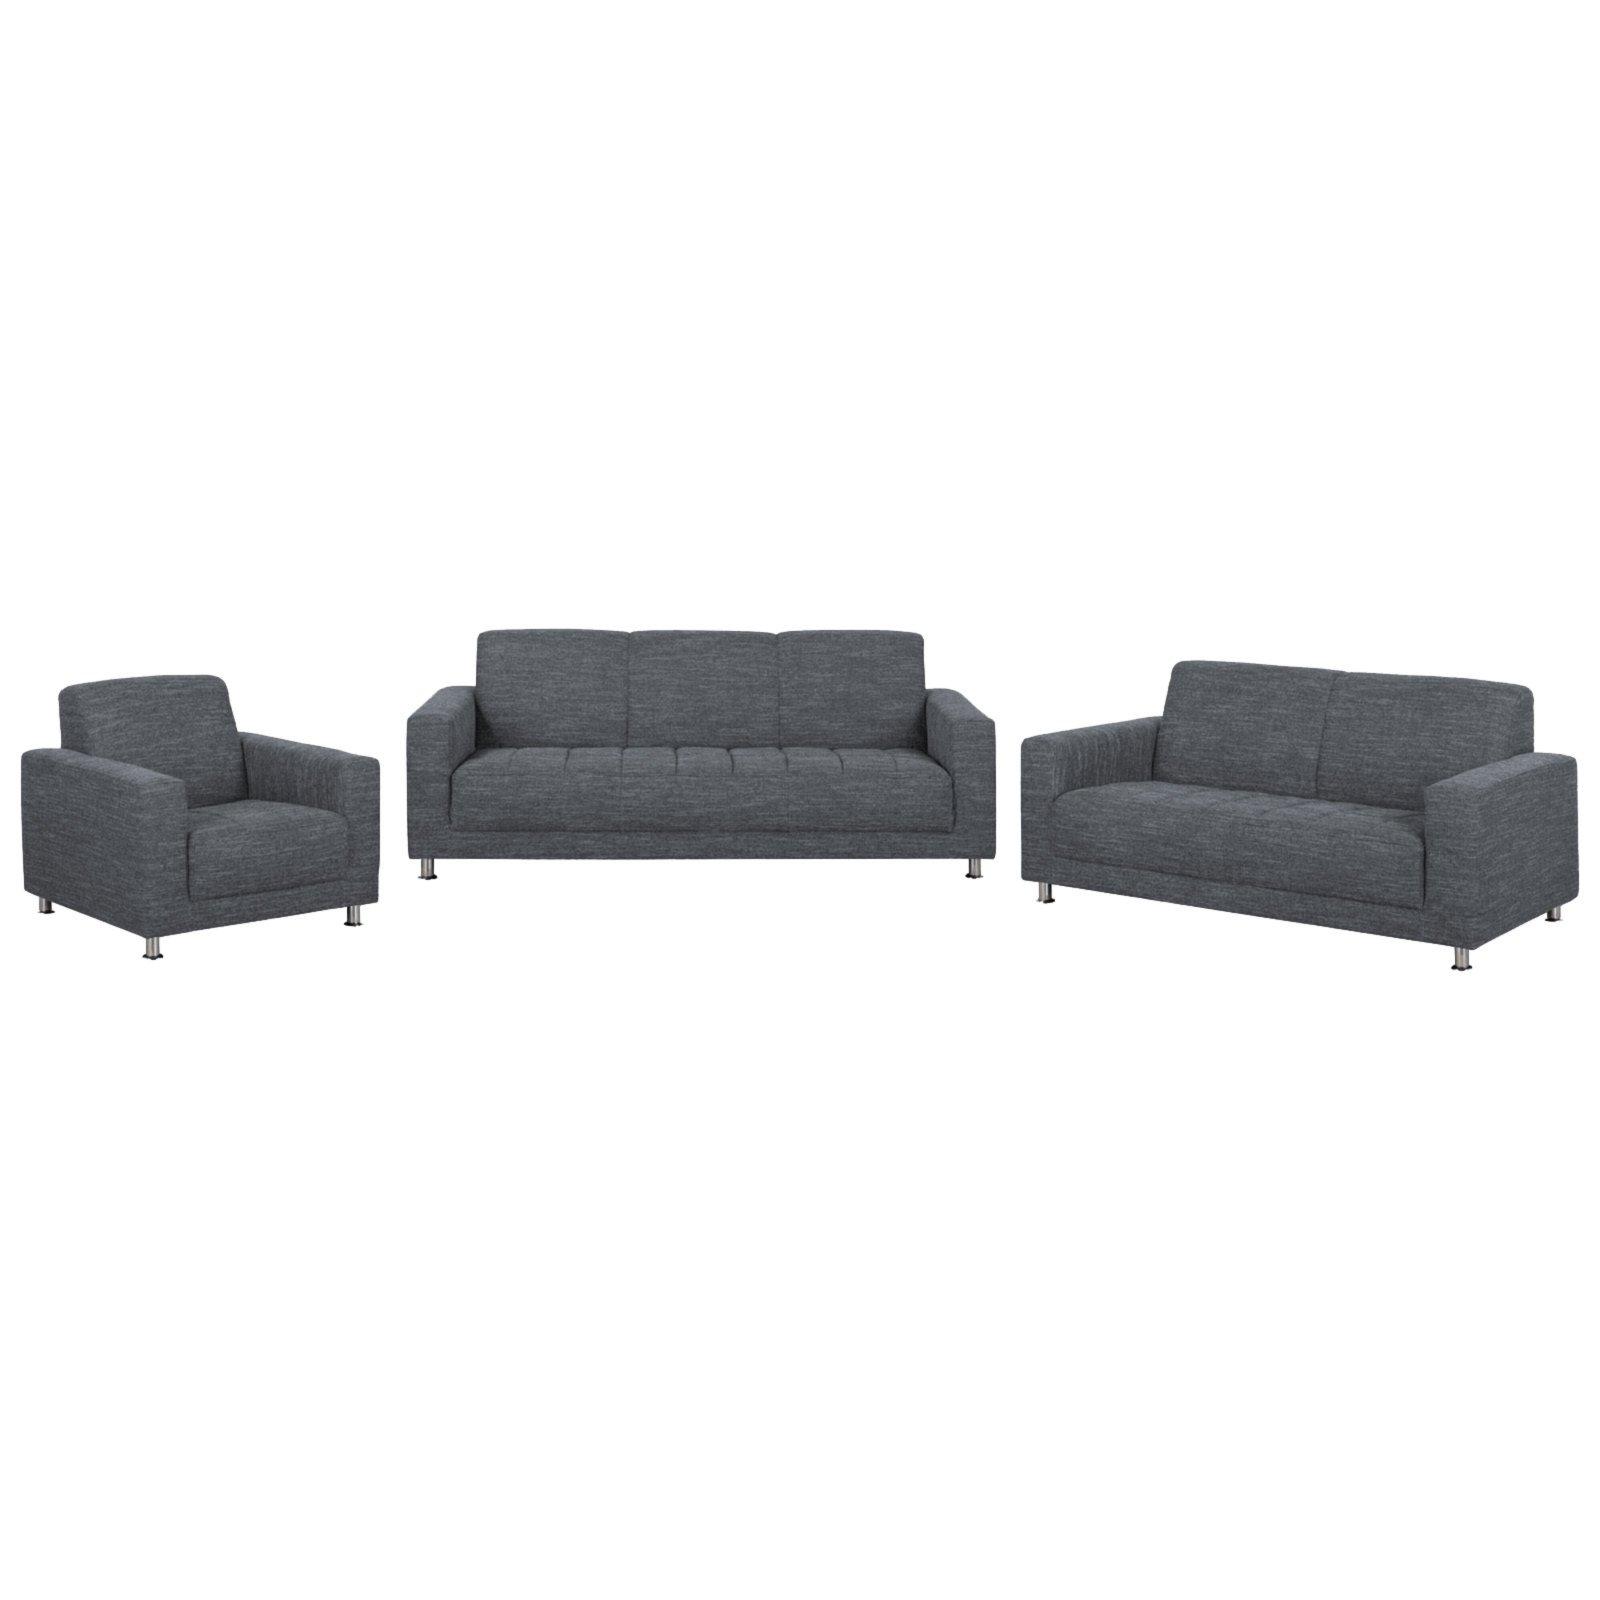 polstergarnitur grau chromf e sofagarnituren sets sofas couches m bel roller. Black Bedroom Furniture Sets. Home Design Ideas